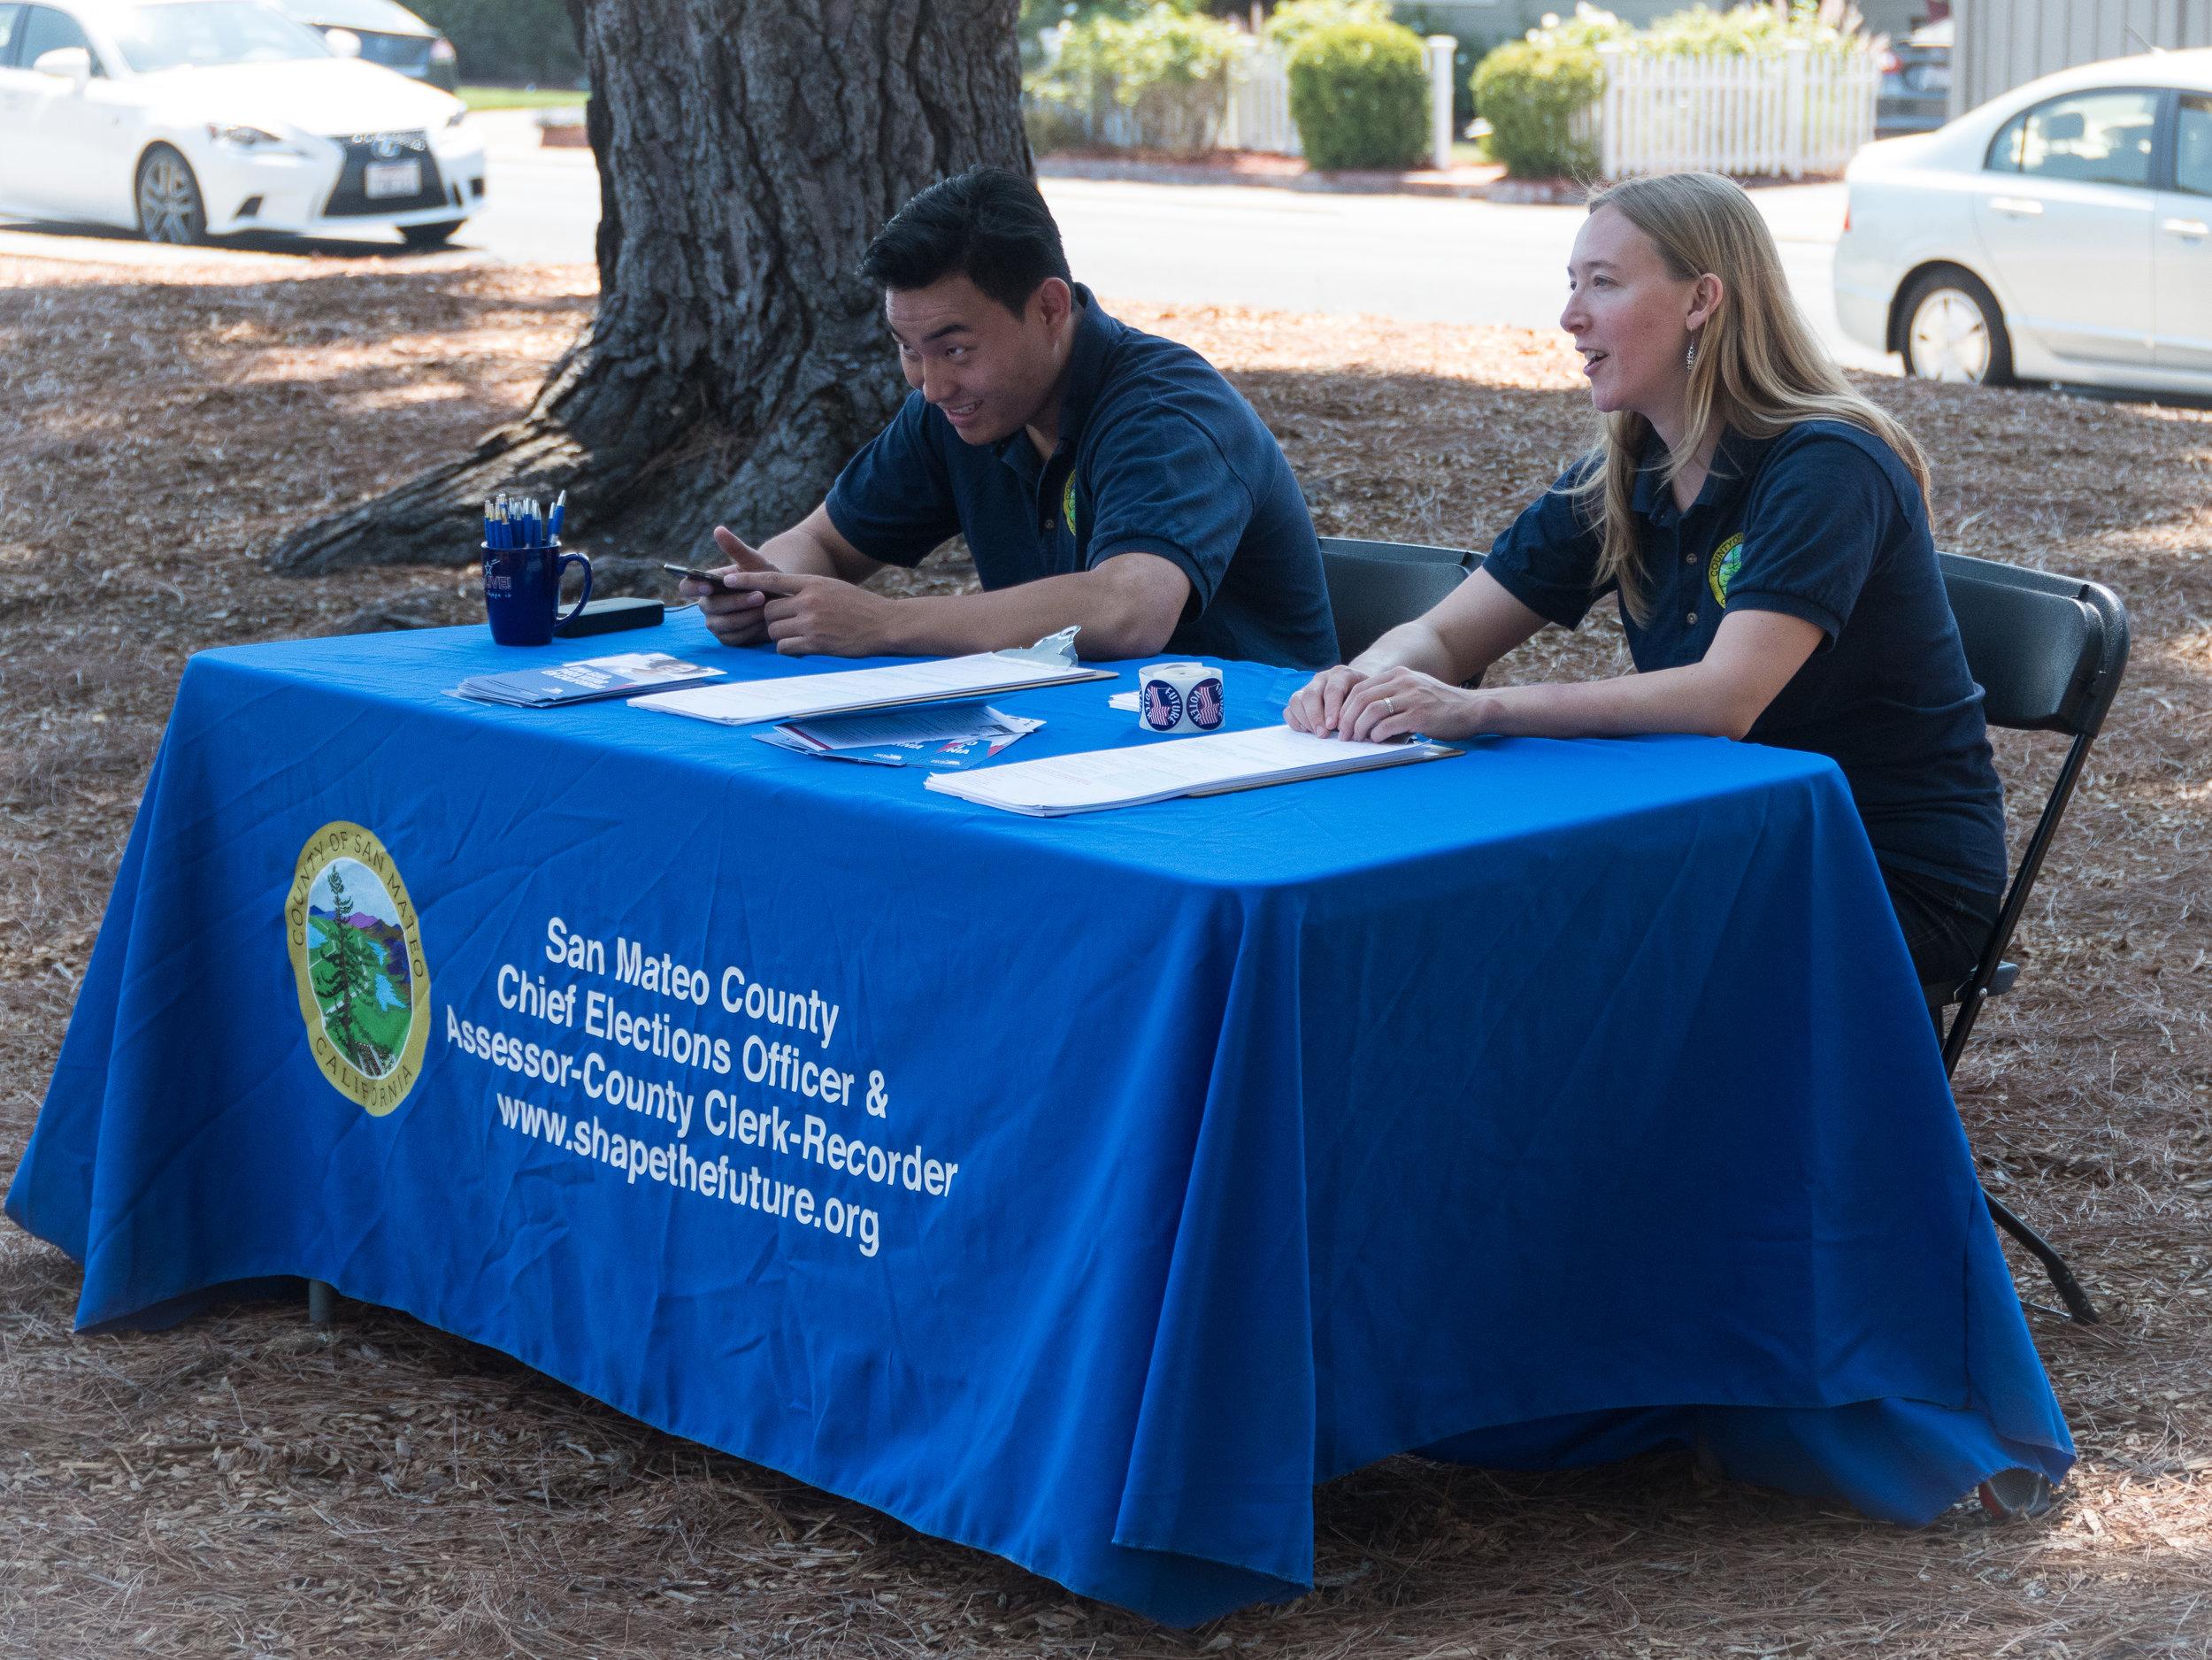 San Mateo County Voter Registration team